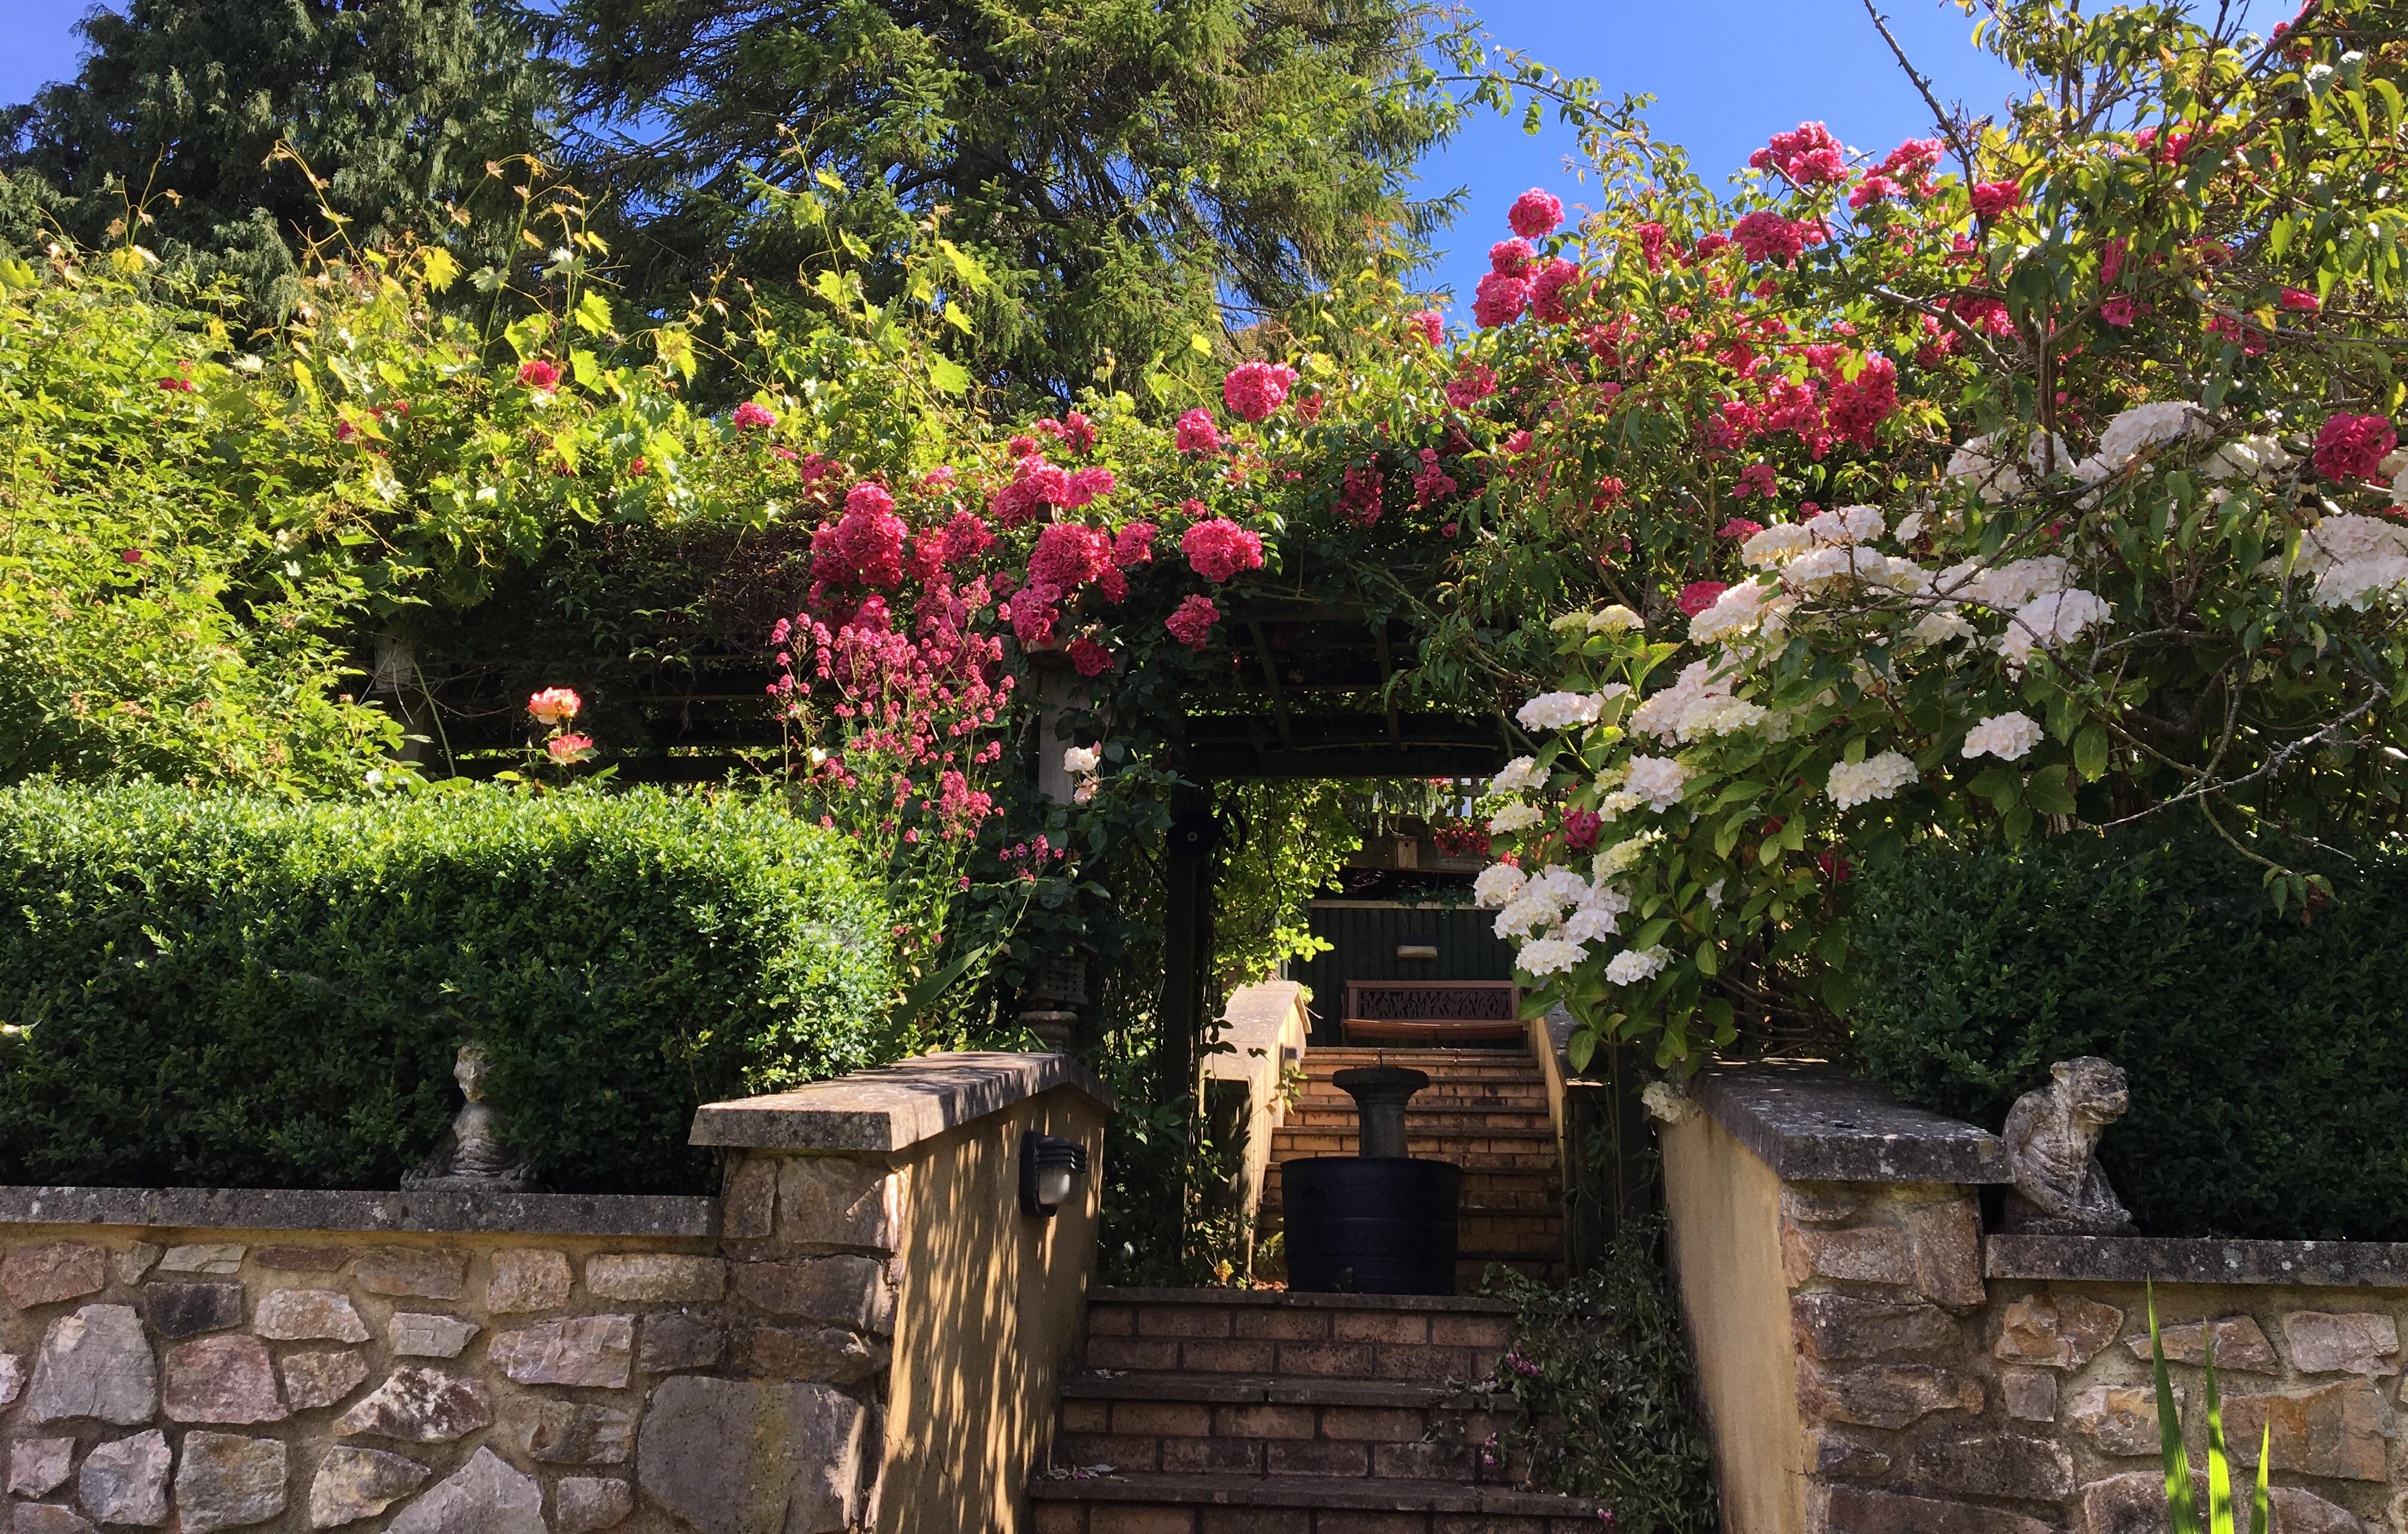 August garden jobs